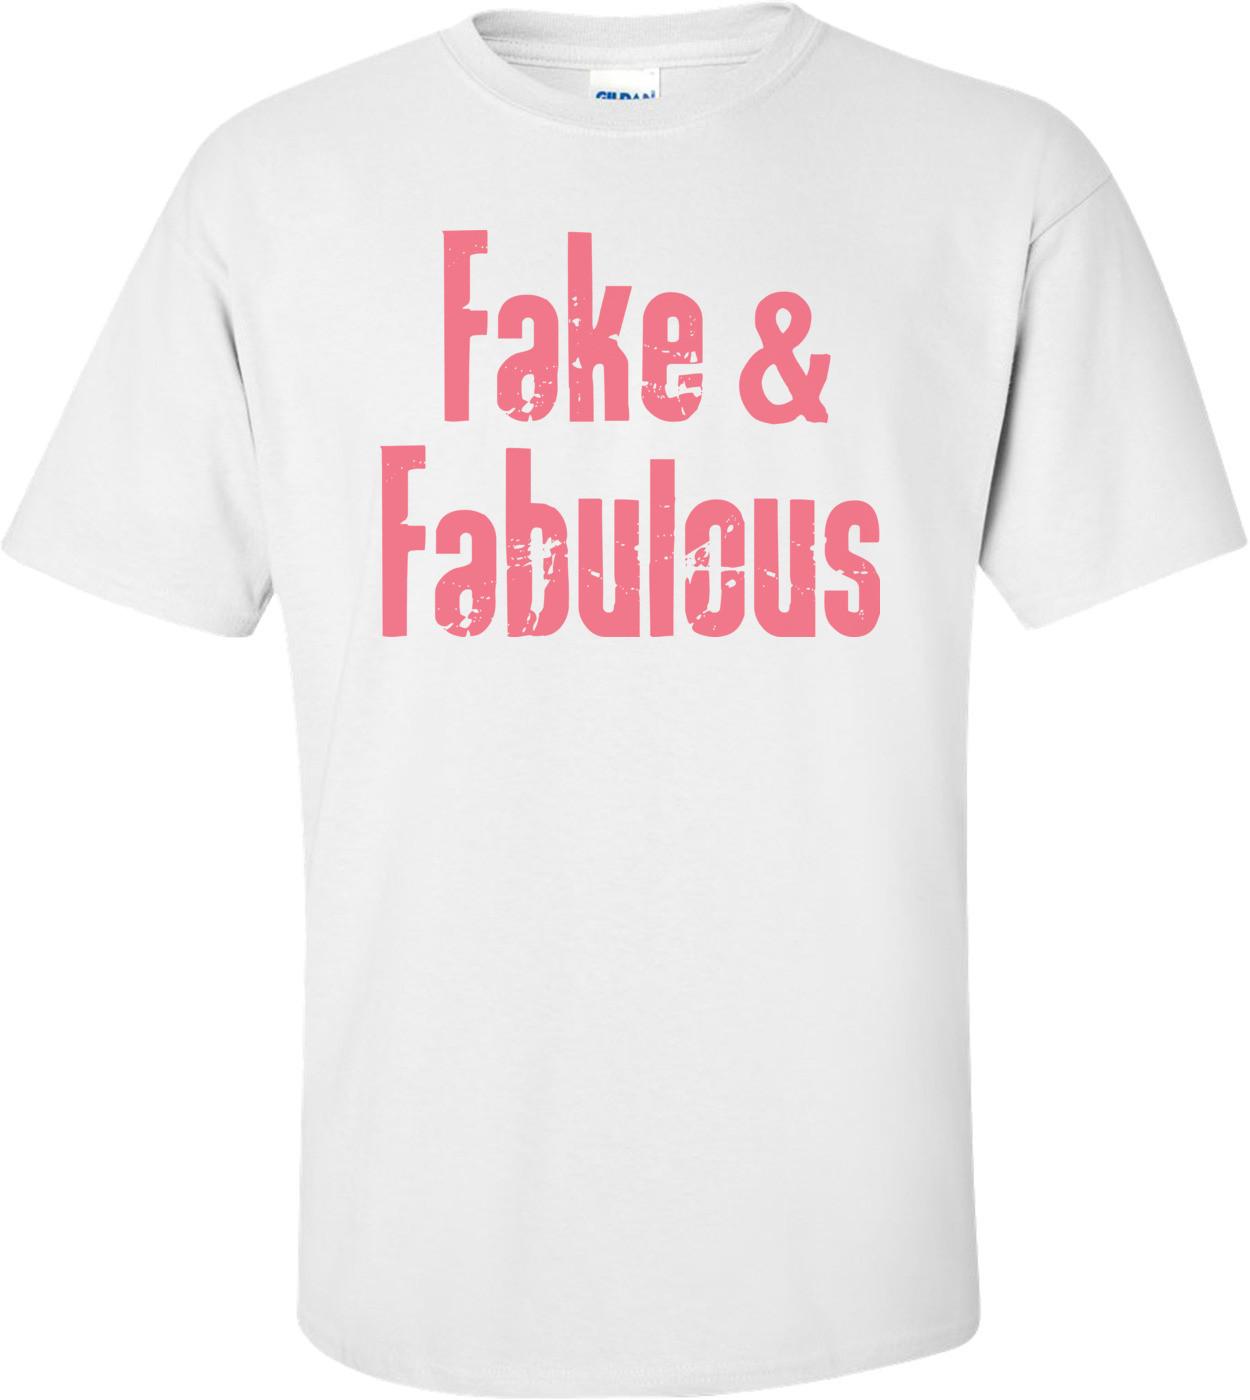 Fake And Fabulous Custom T-shirt